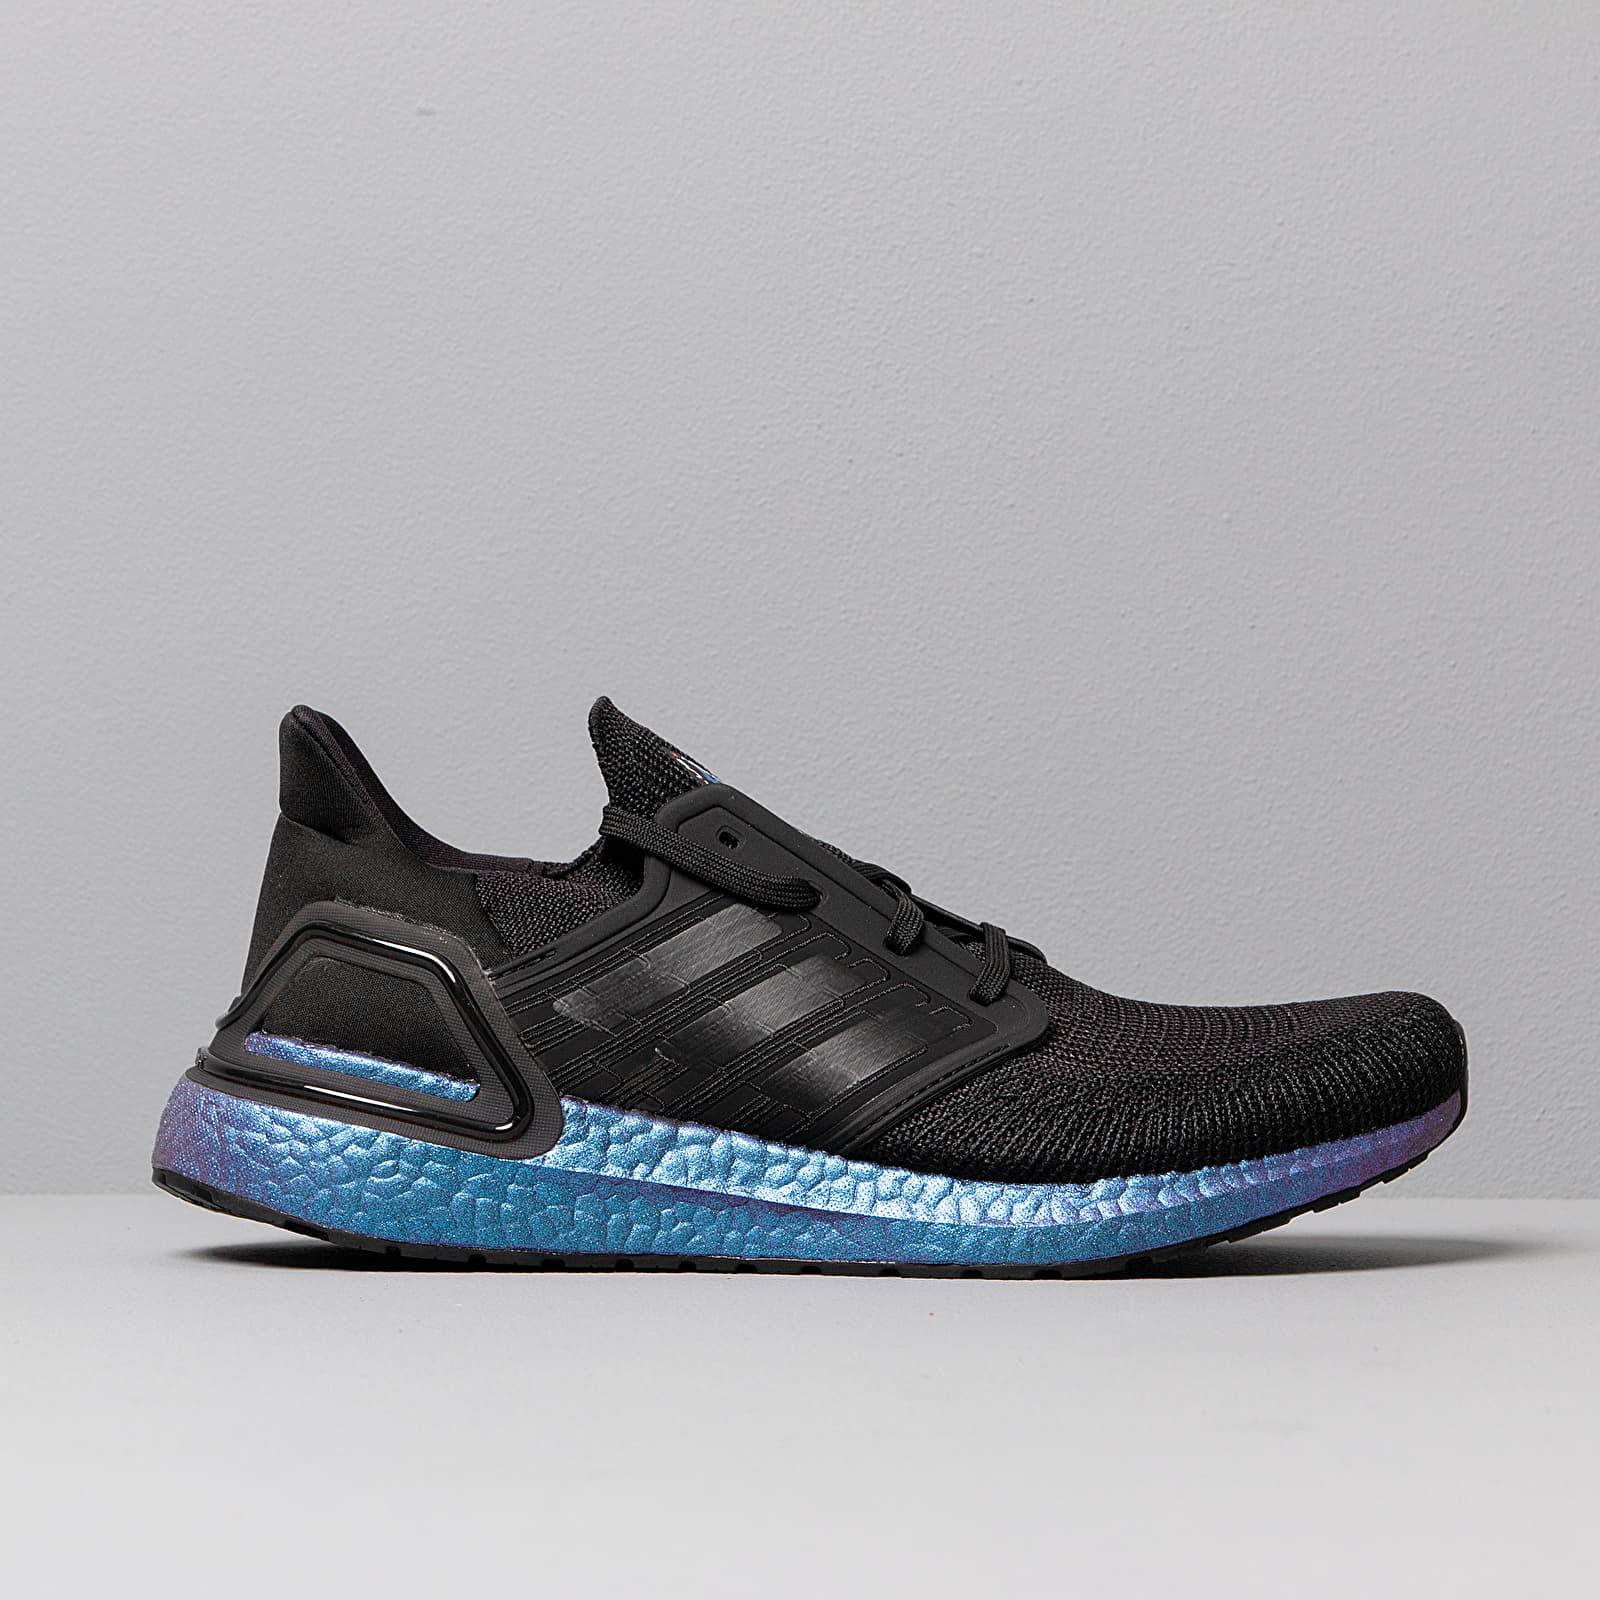 [Footshop] Adidas Ultra Boost 20